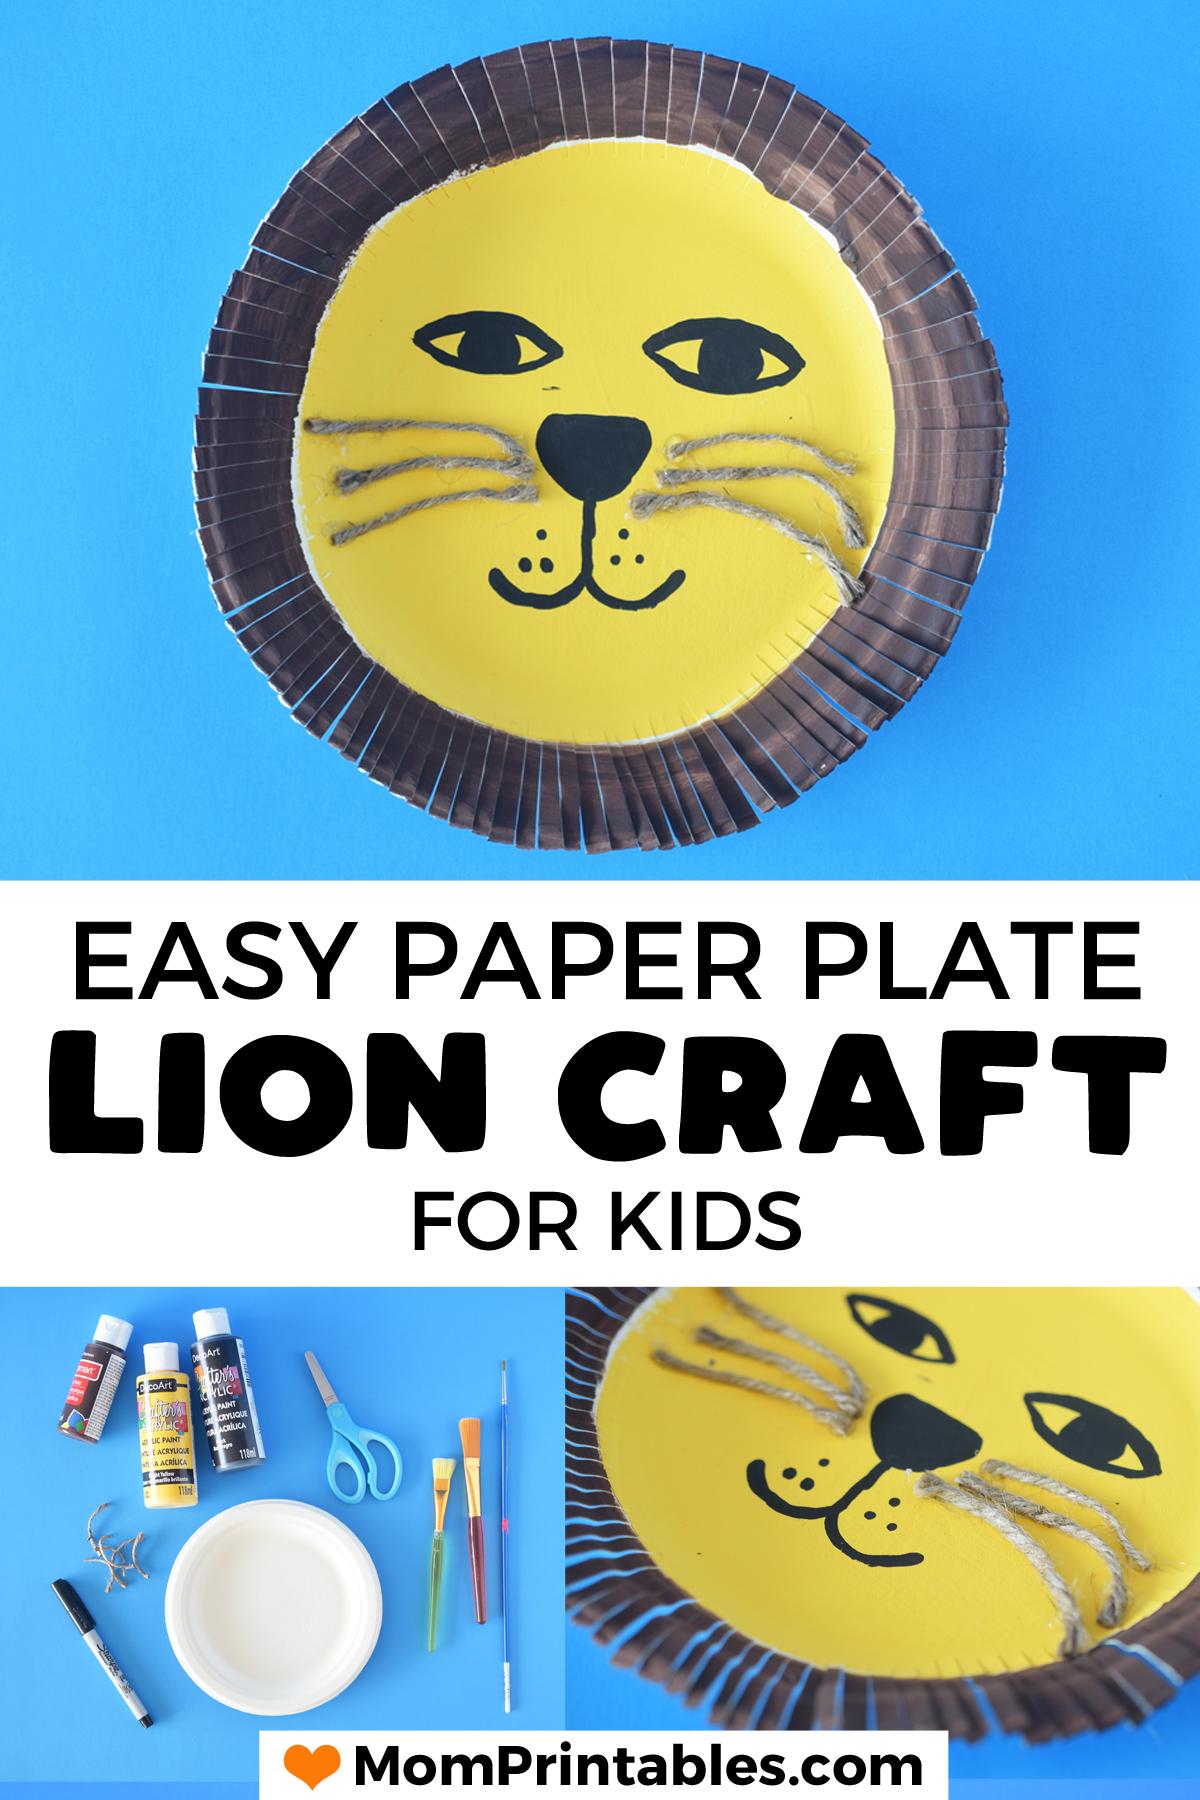 Lion craft preschool paper plate | art projects | kids | toddlers | kindergarten | fun | animals | children | simple | motor skills | learning | classroom | student | virus theme | paper plate craft | cutting skills #kidscraft #paperplate #lioncraft